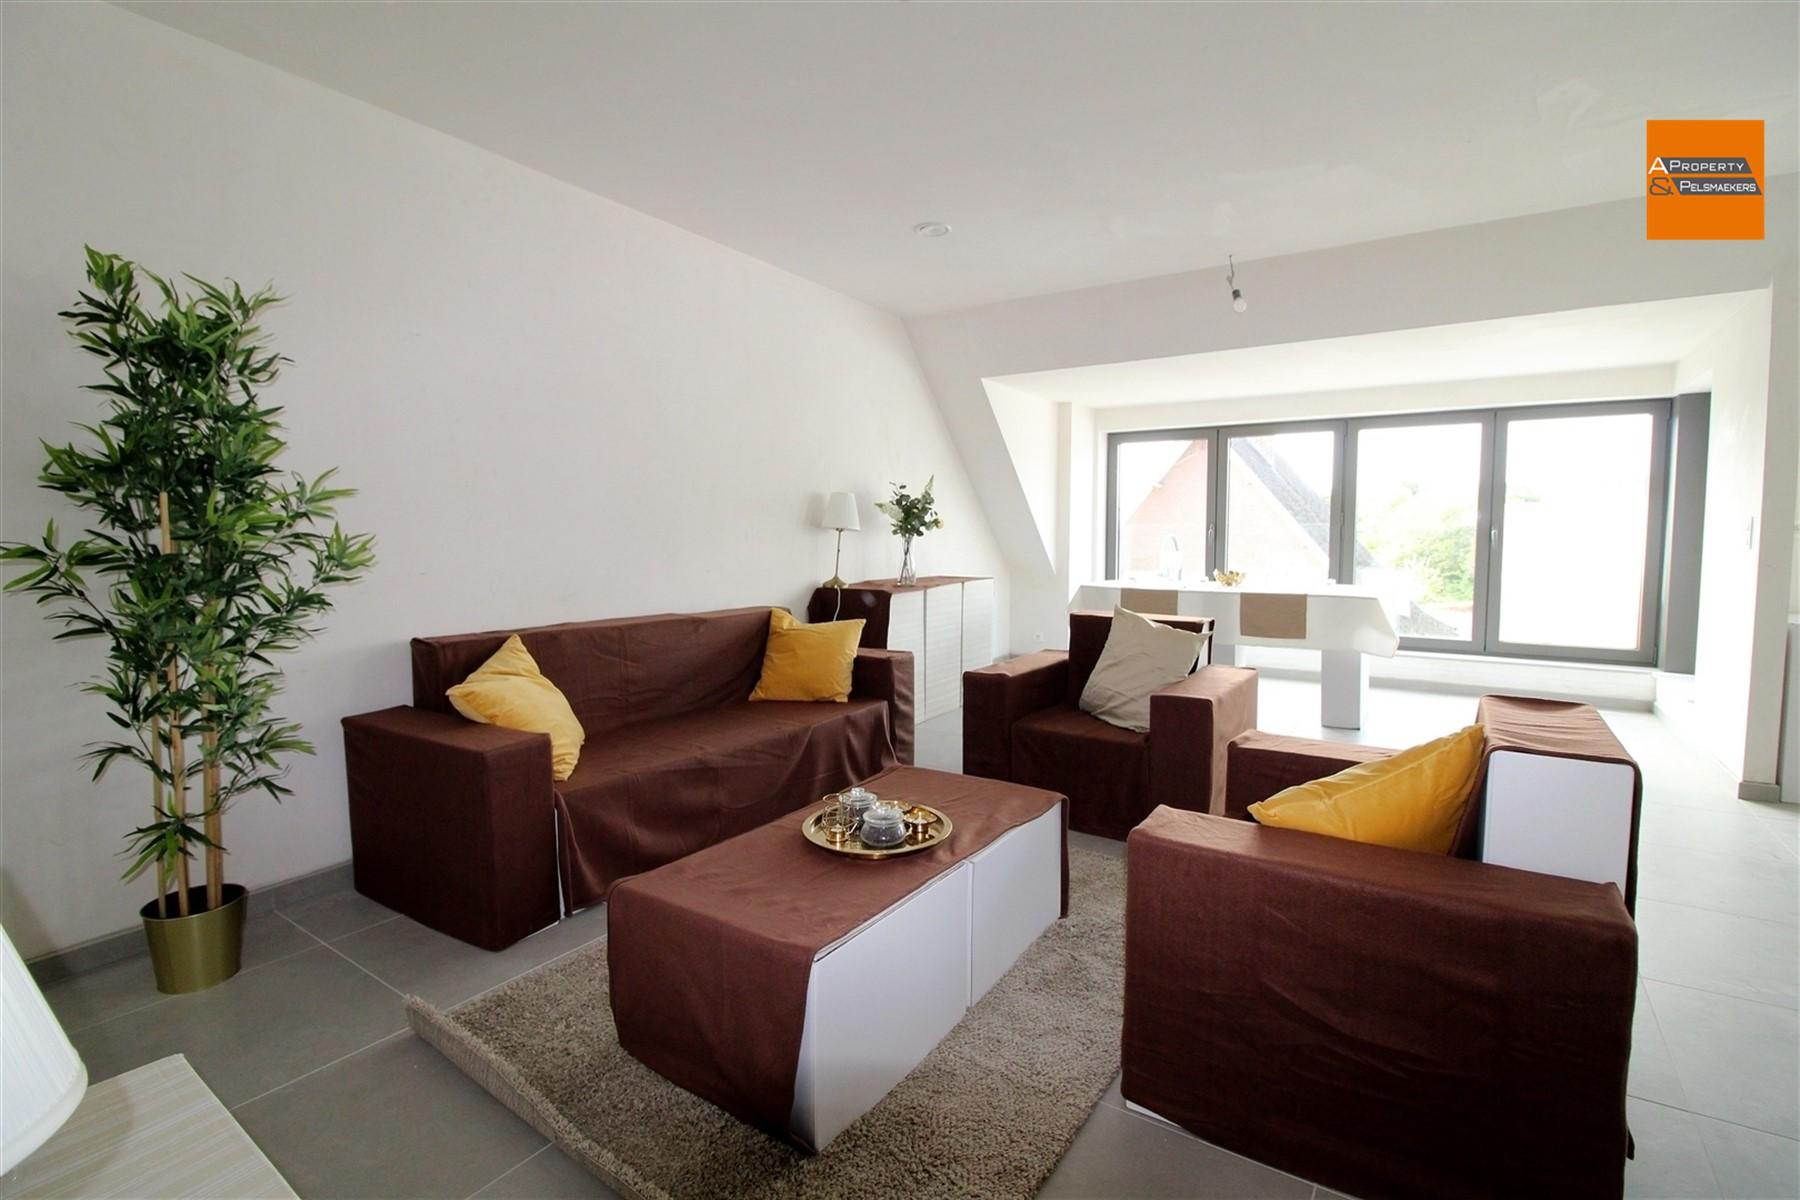 Foto 2 : Duplex/triplex in 3060 BERTEM (België) - Prijs € 319.000